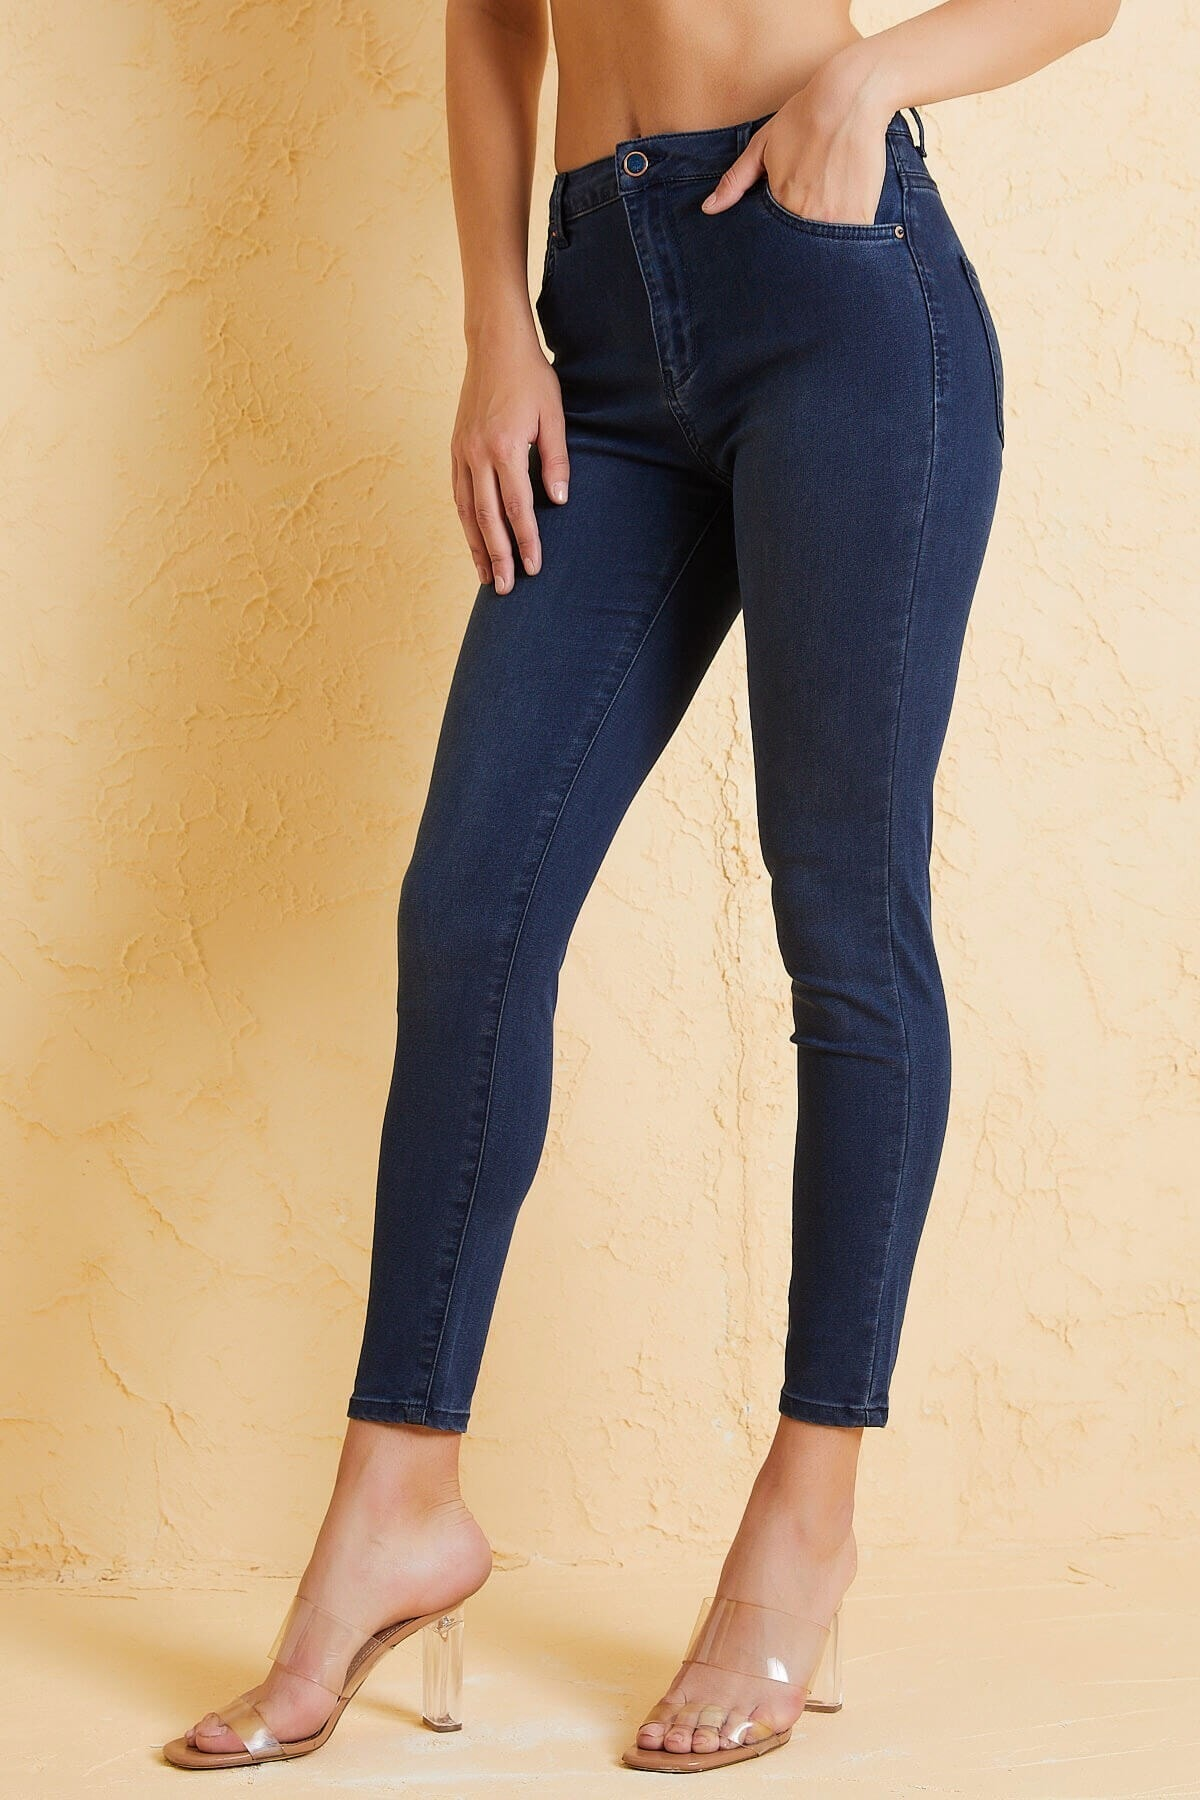 Twister Jeans Kadın Slim Fit Orta Bel Pantolon Lıma 9046-76 Lacıvert 2